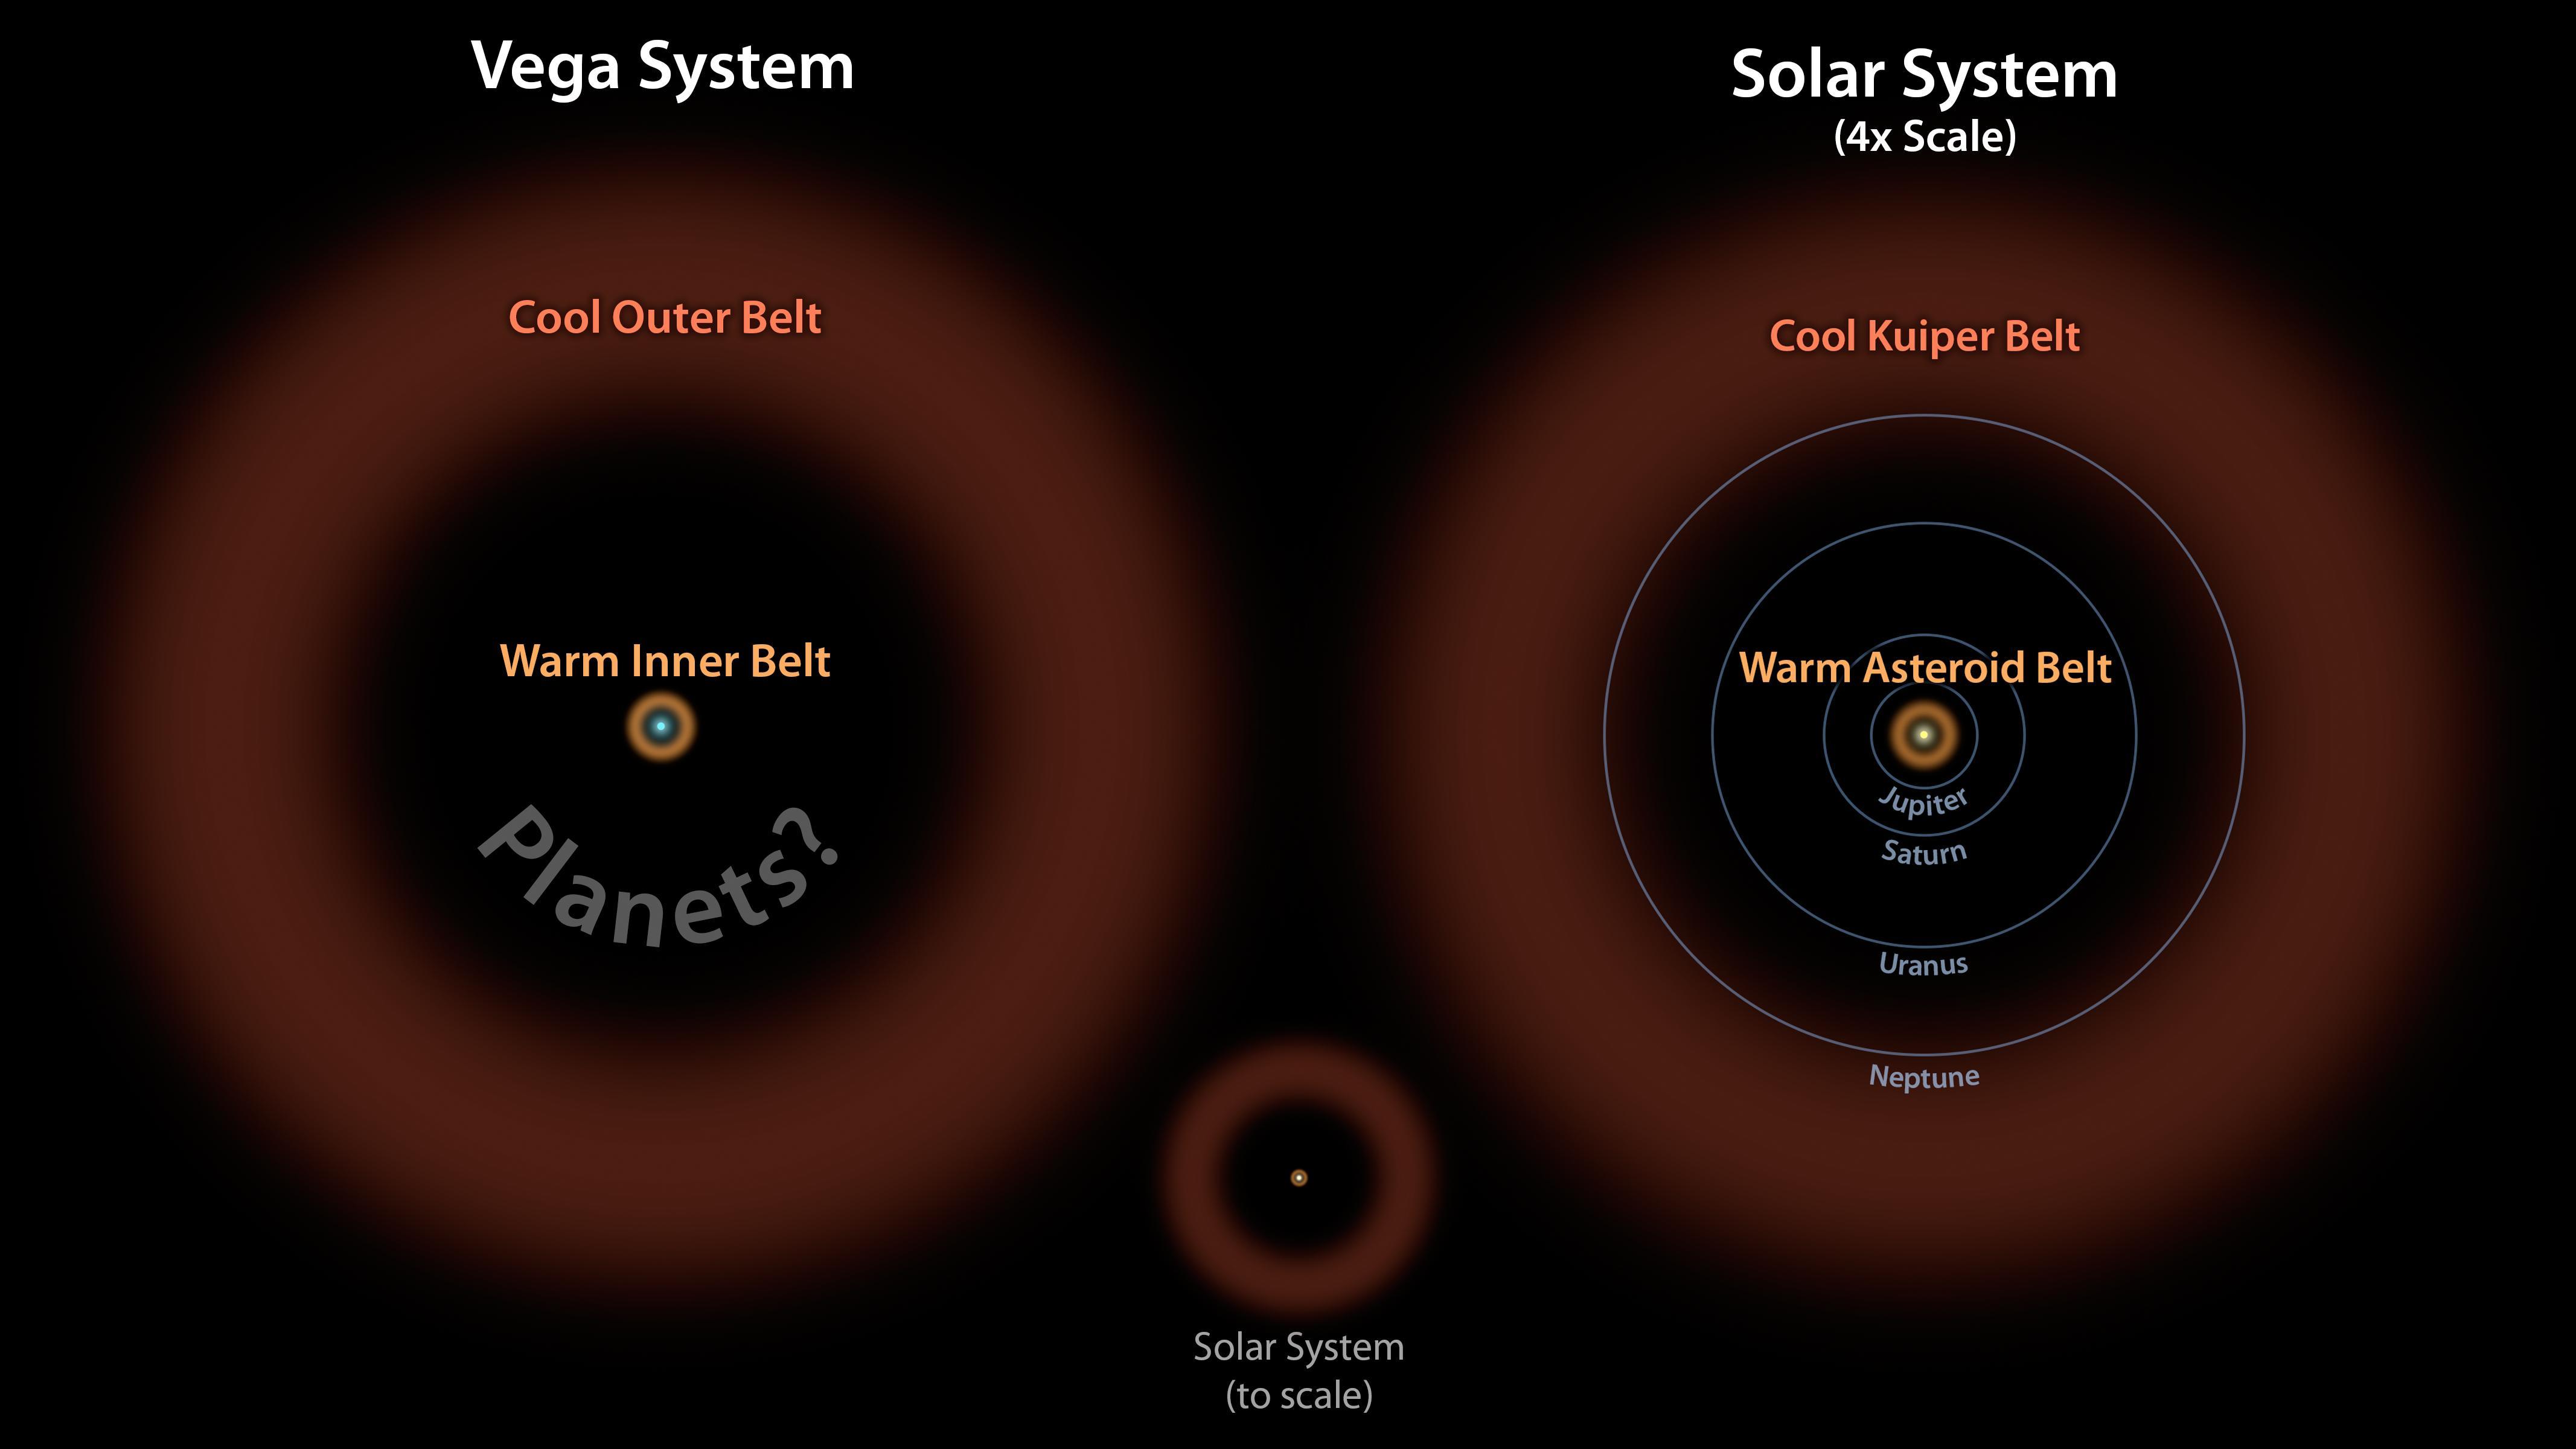 Vega Star System